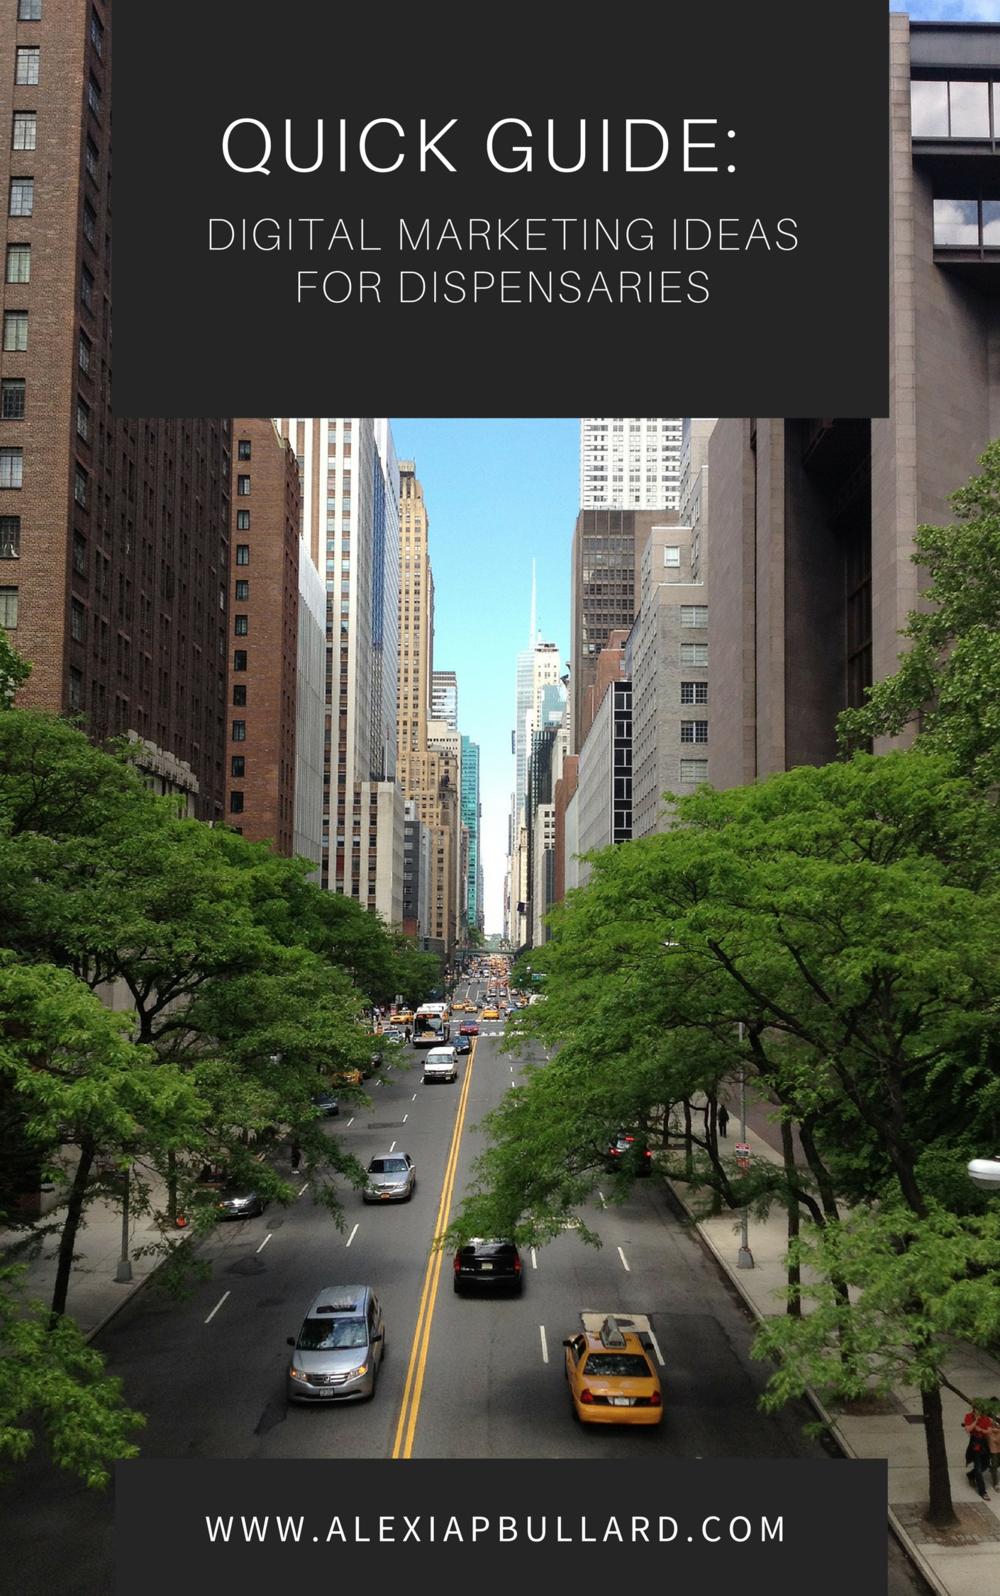 Quick Guide: Digital Marketing Ideas for Dispensaries Booklexia Content Marketing alexiapbullard.com